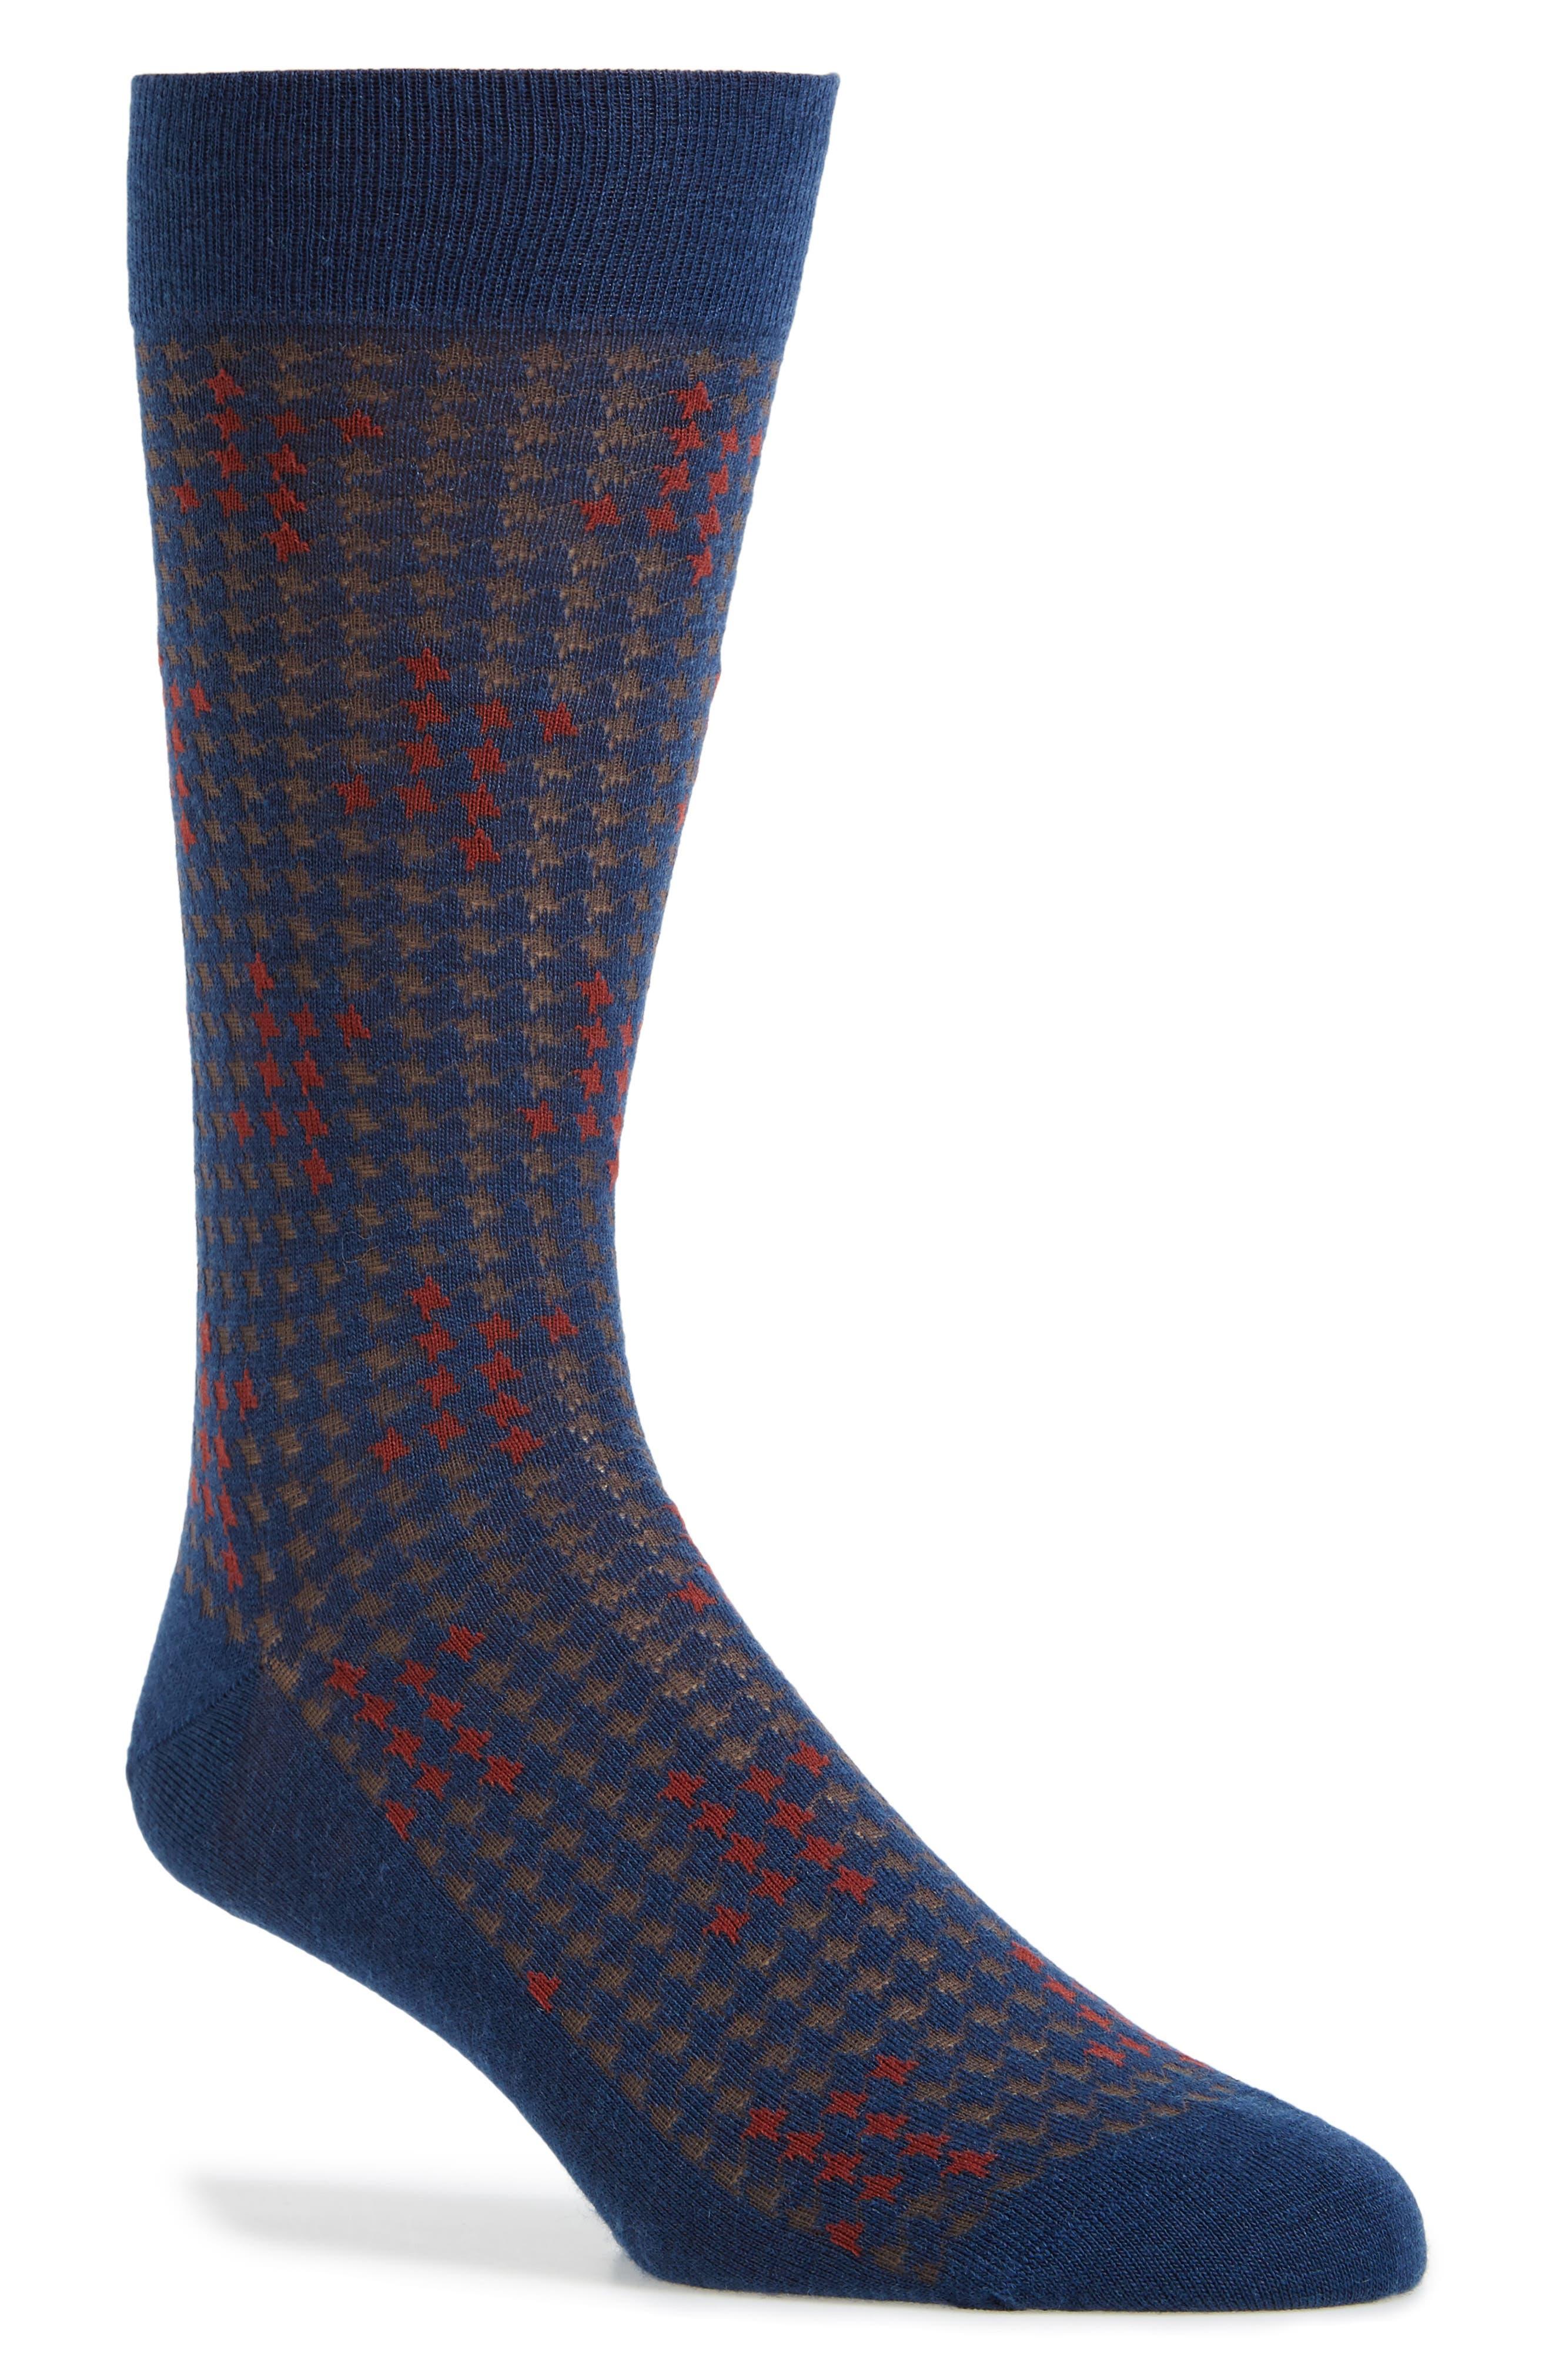 Main Image - Pantherella Houndstooth Socks